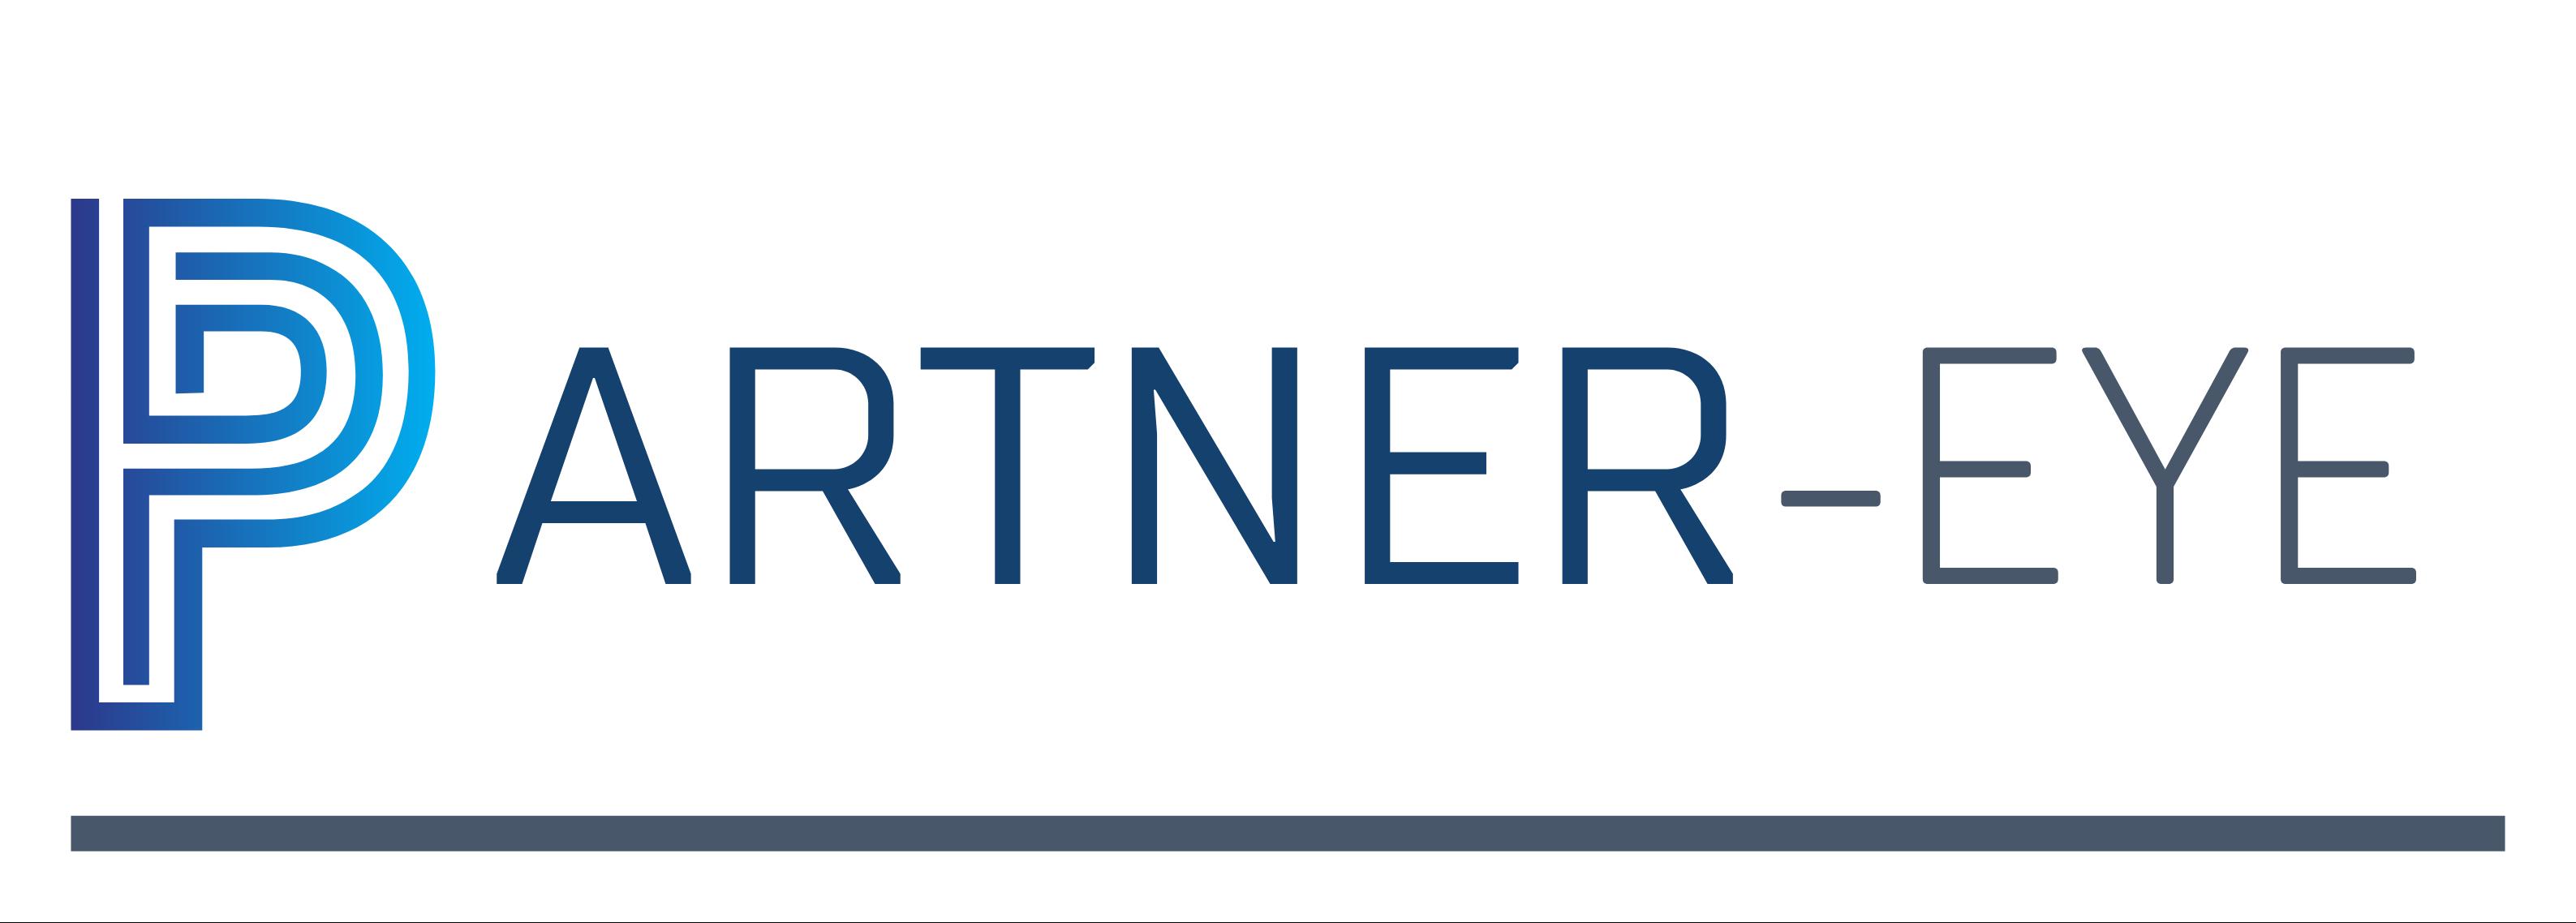 Partner-Eye logo